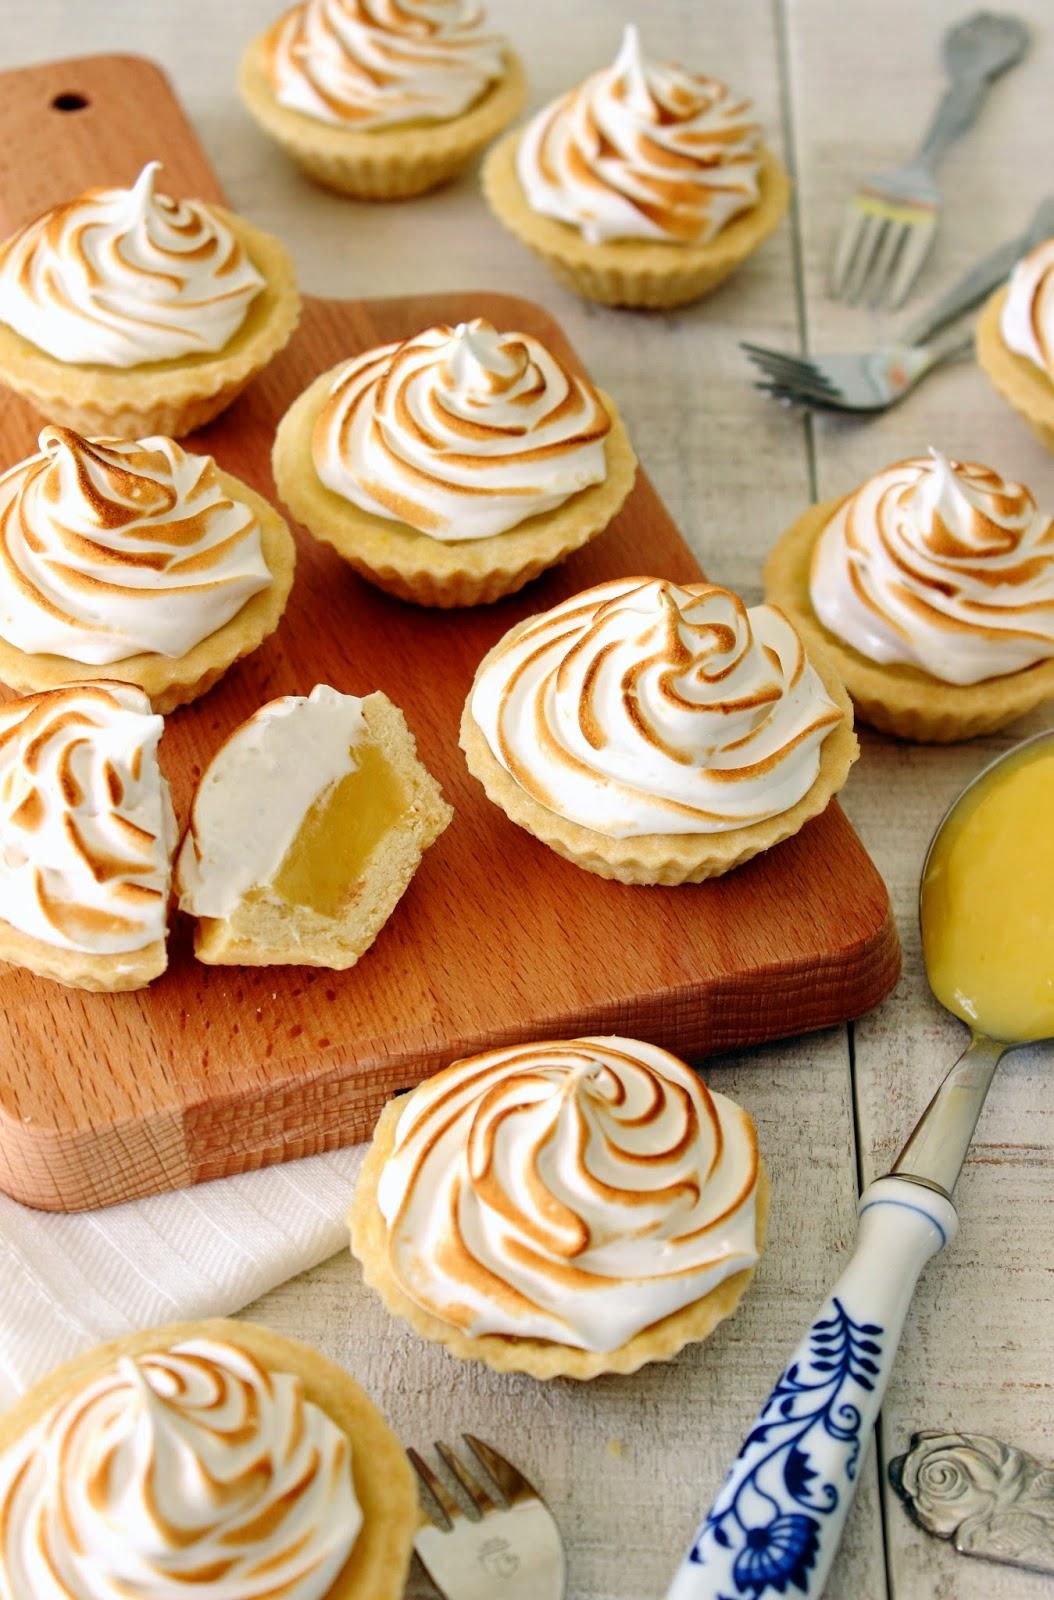 Mini citroen meringue taartjes / Mini lemon meringue pies